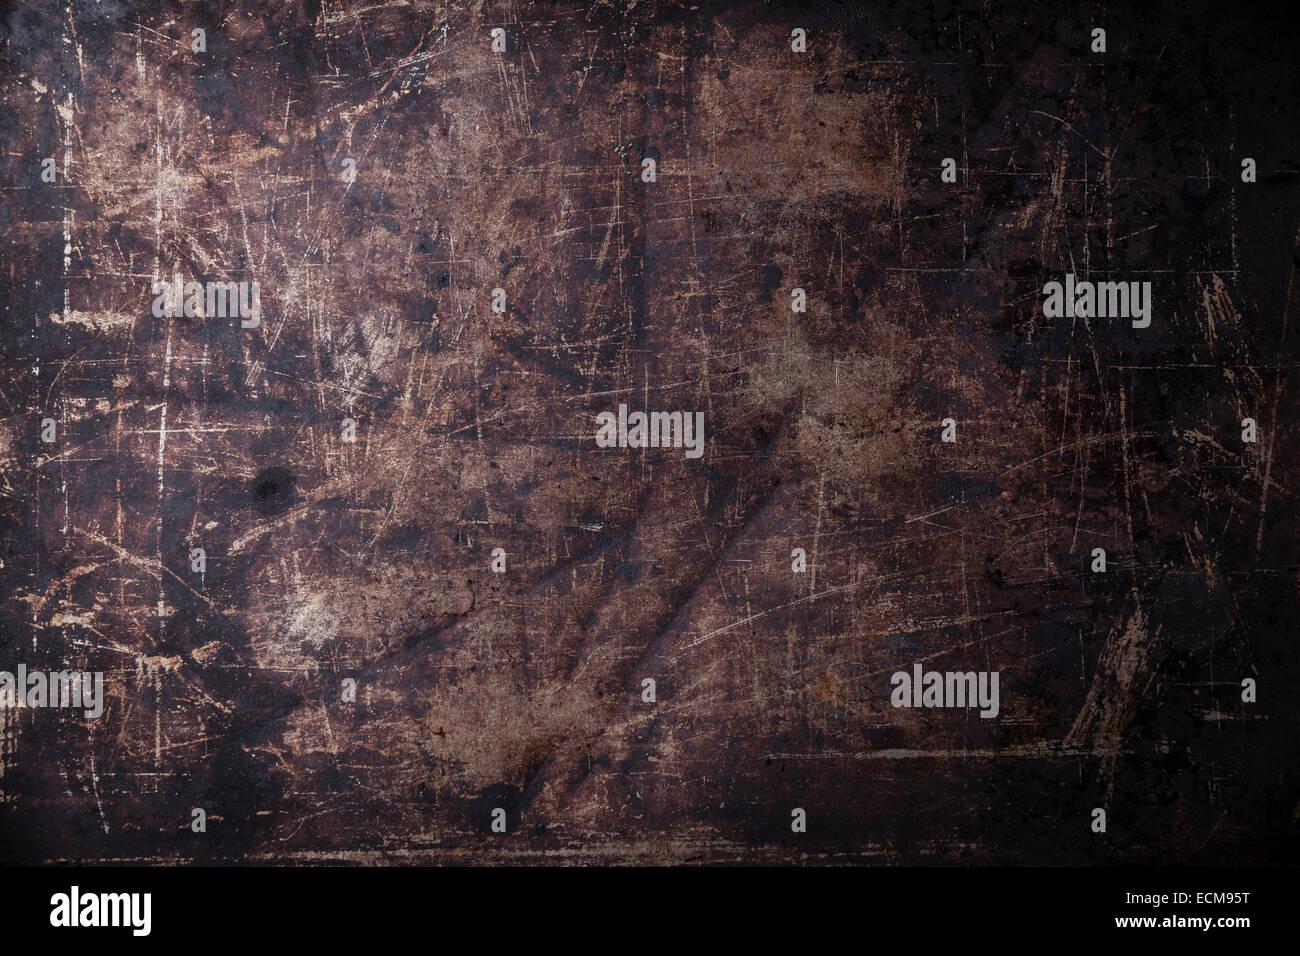 Old scratched black dark background texture - Stock Image